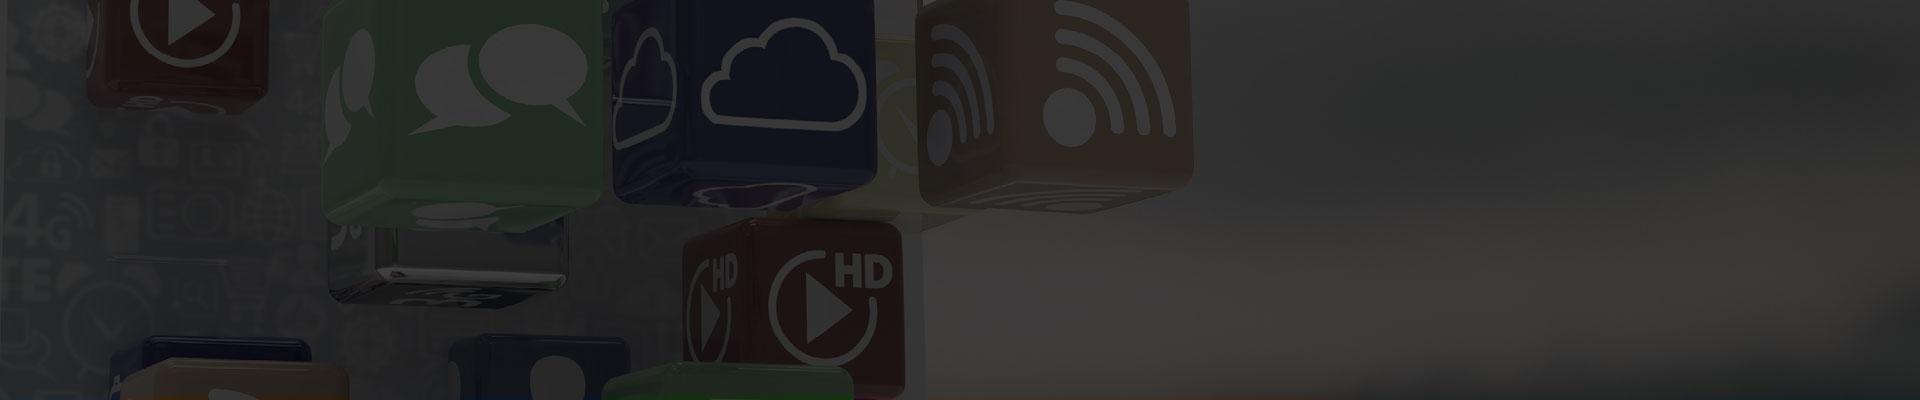 Header image of Custom Apps